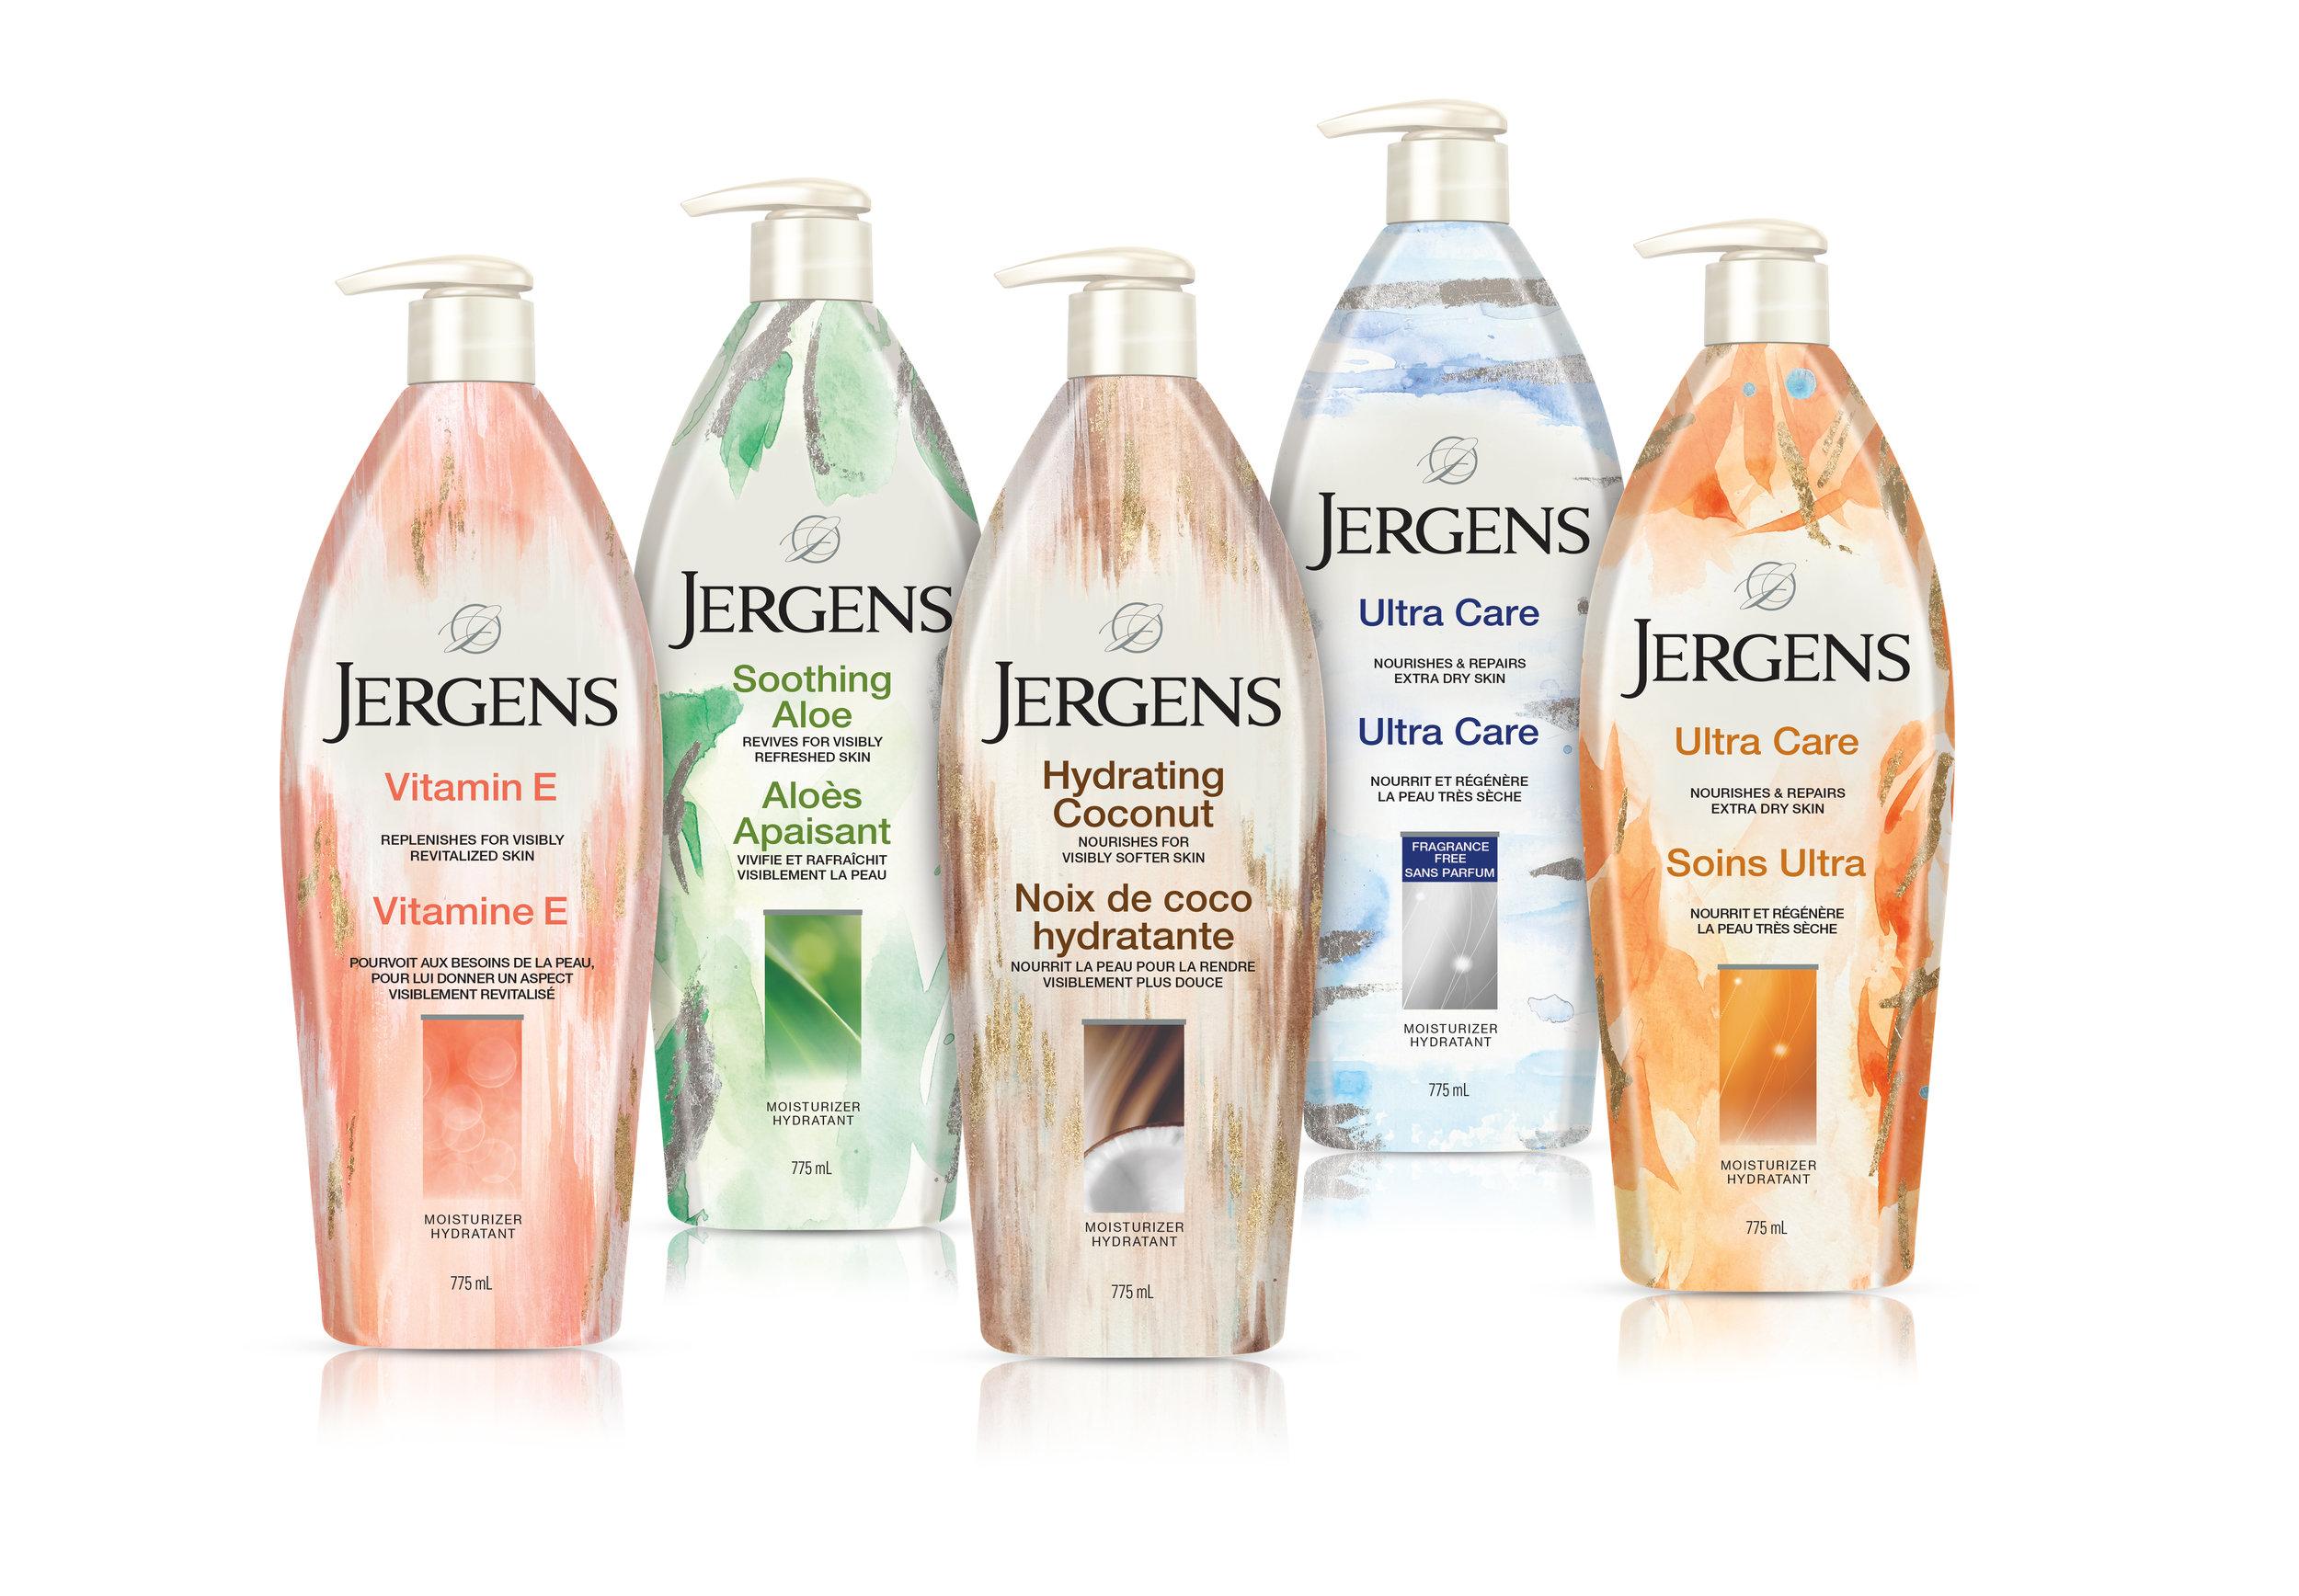 Dana-Mooney-Jergens-Canada-lotion-bottles.jpg